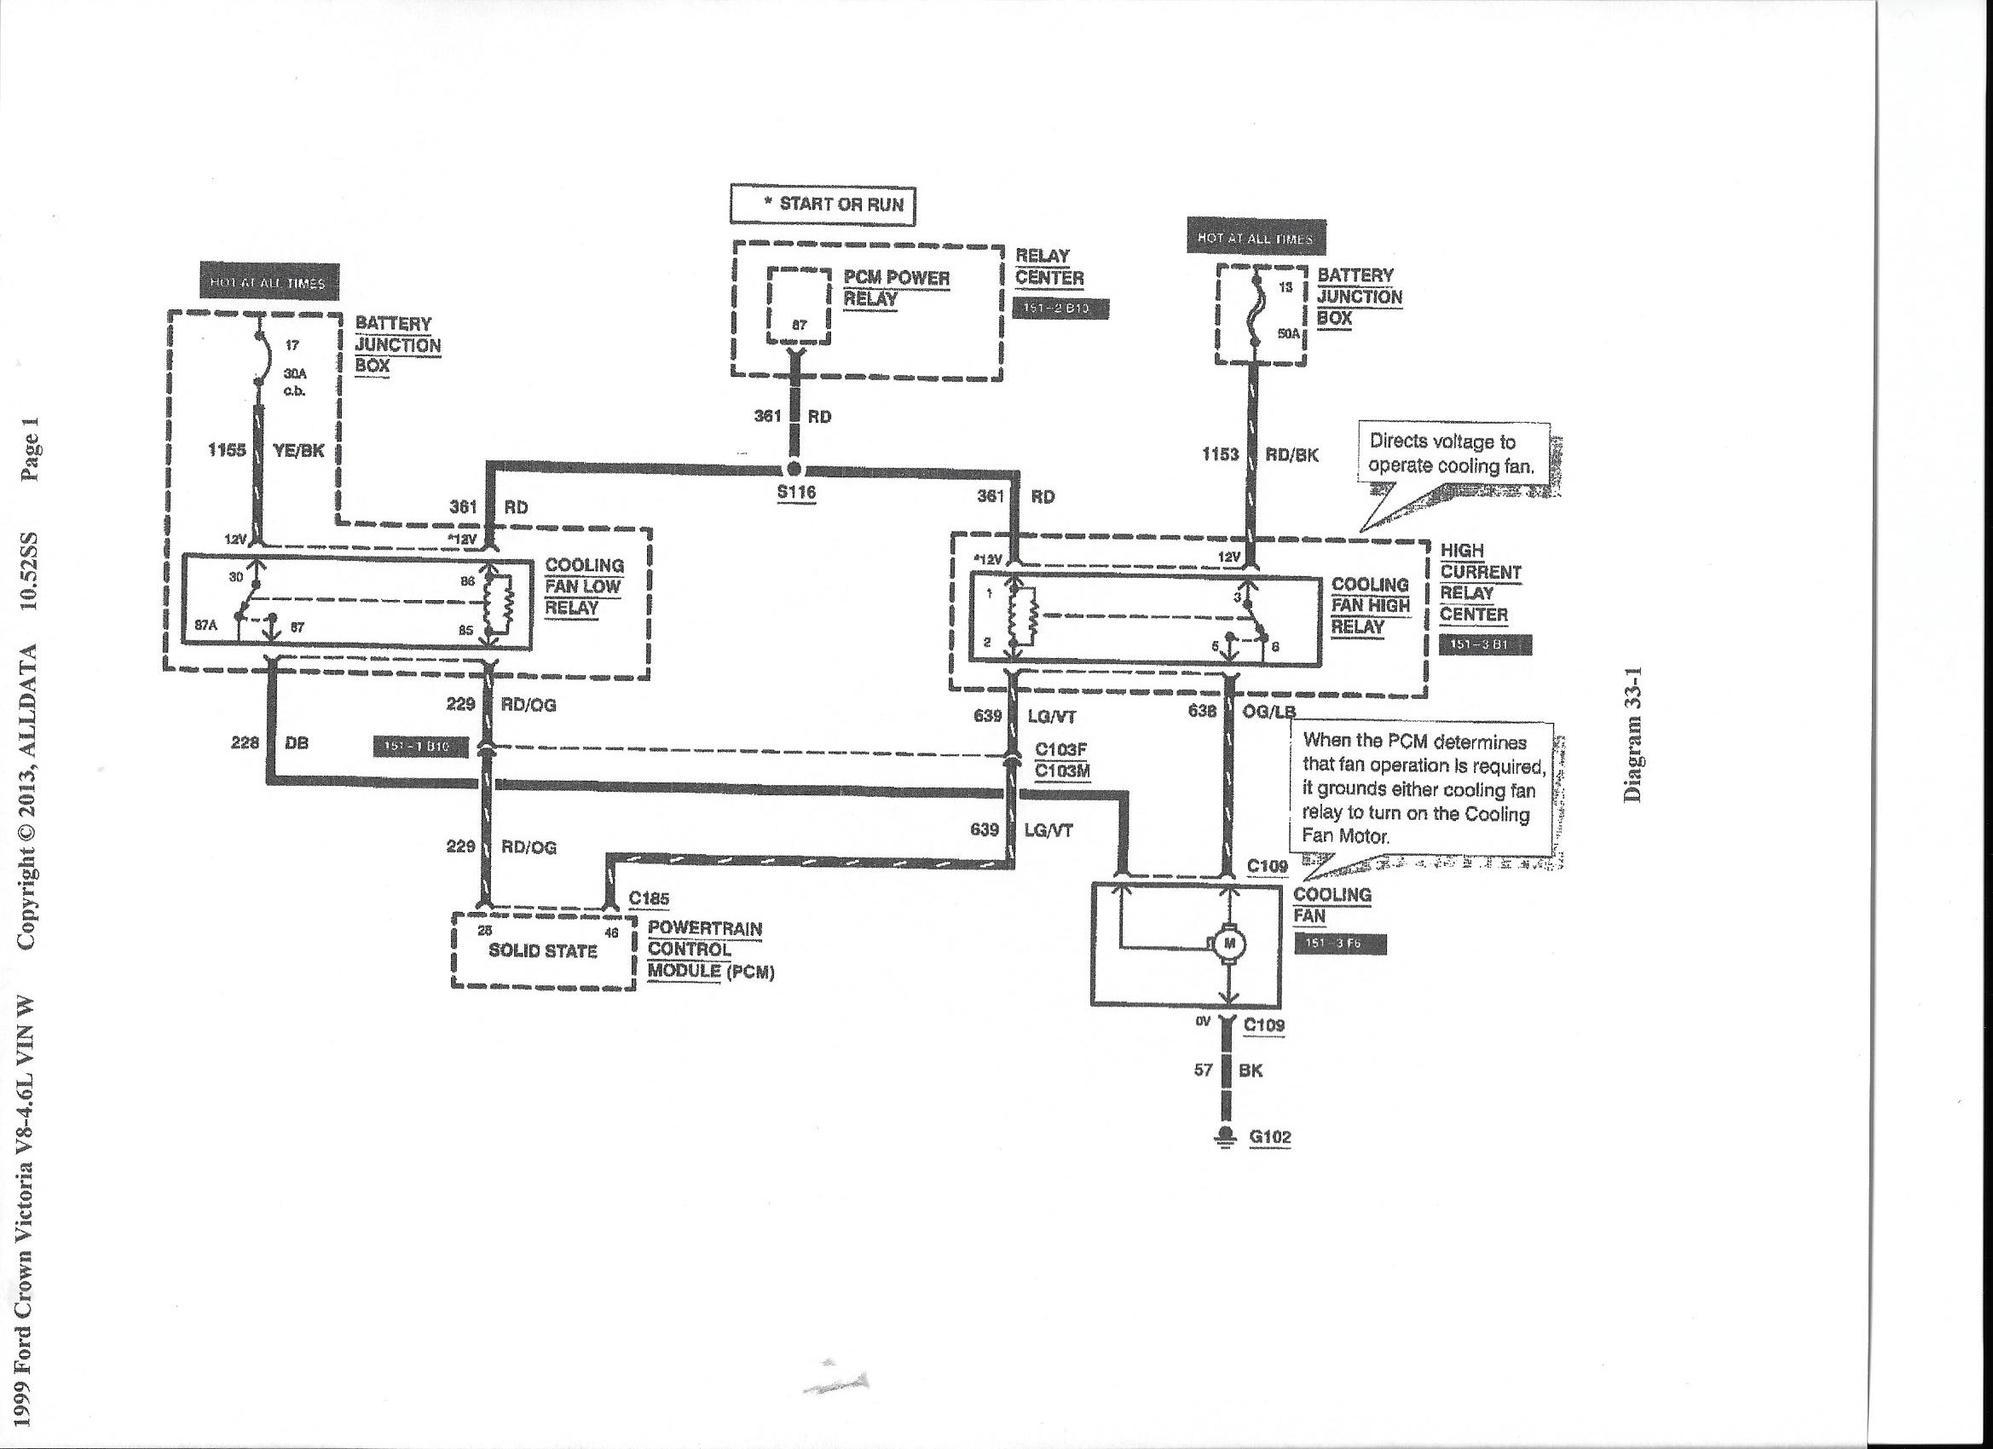 80 scan_4_e191f04f95ccbf7b639d5596890acddef8fc2e3b?resize=665%2C483 2006 peterbilt 379 headlight wiring diagram tamahuproject org peterbilt 379 headlight wiring diagram at soozxer.org